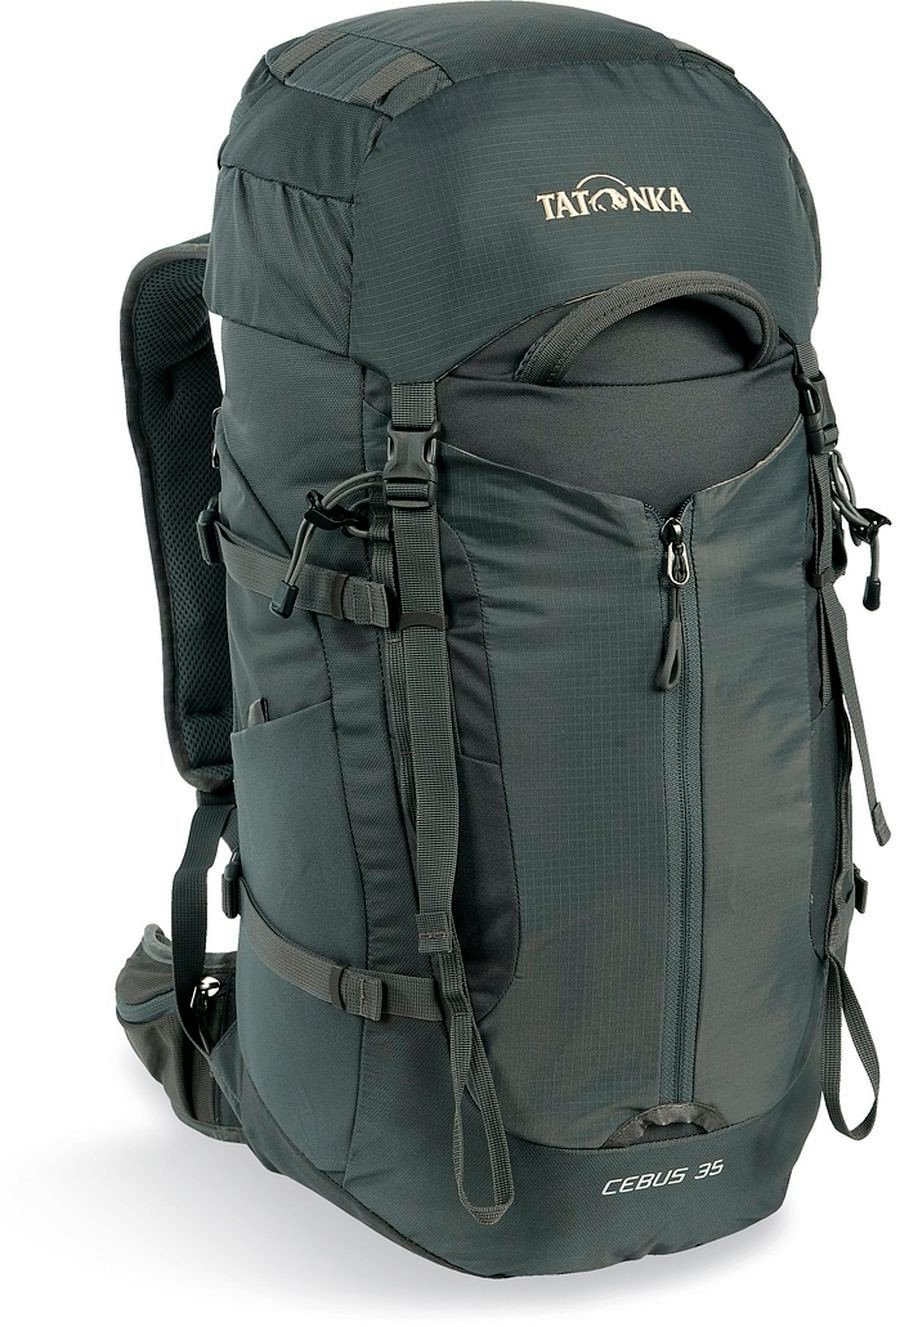 Tatonka Sport- und Freizeittasche »Tatonka Cebus 35 Backpack«